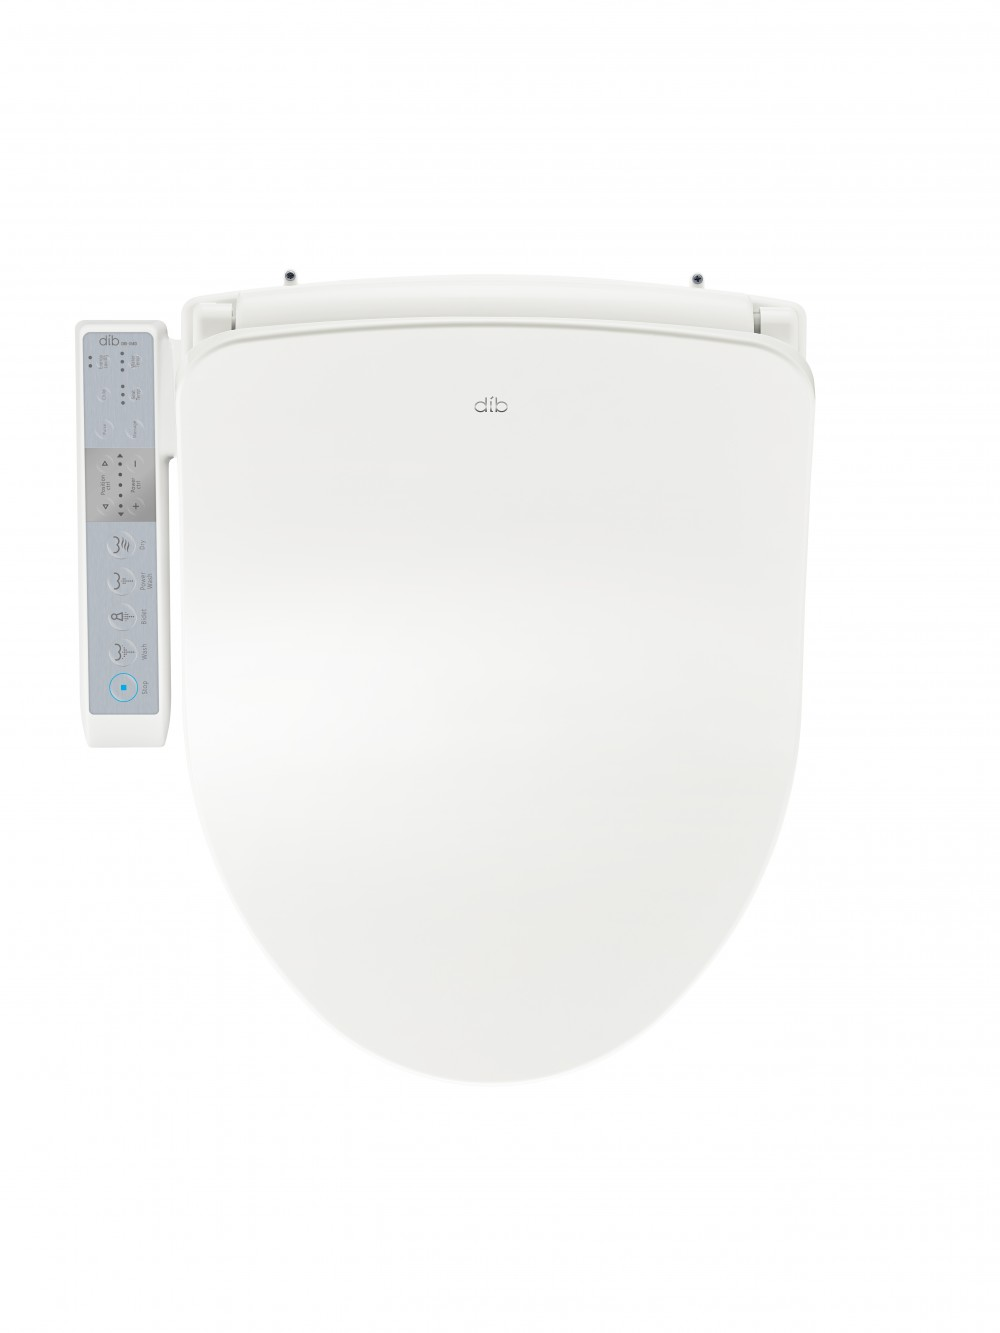 Dib daewon j500 toilet shower washlet